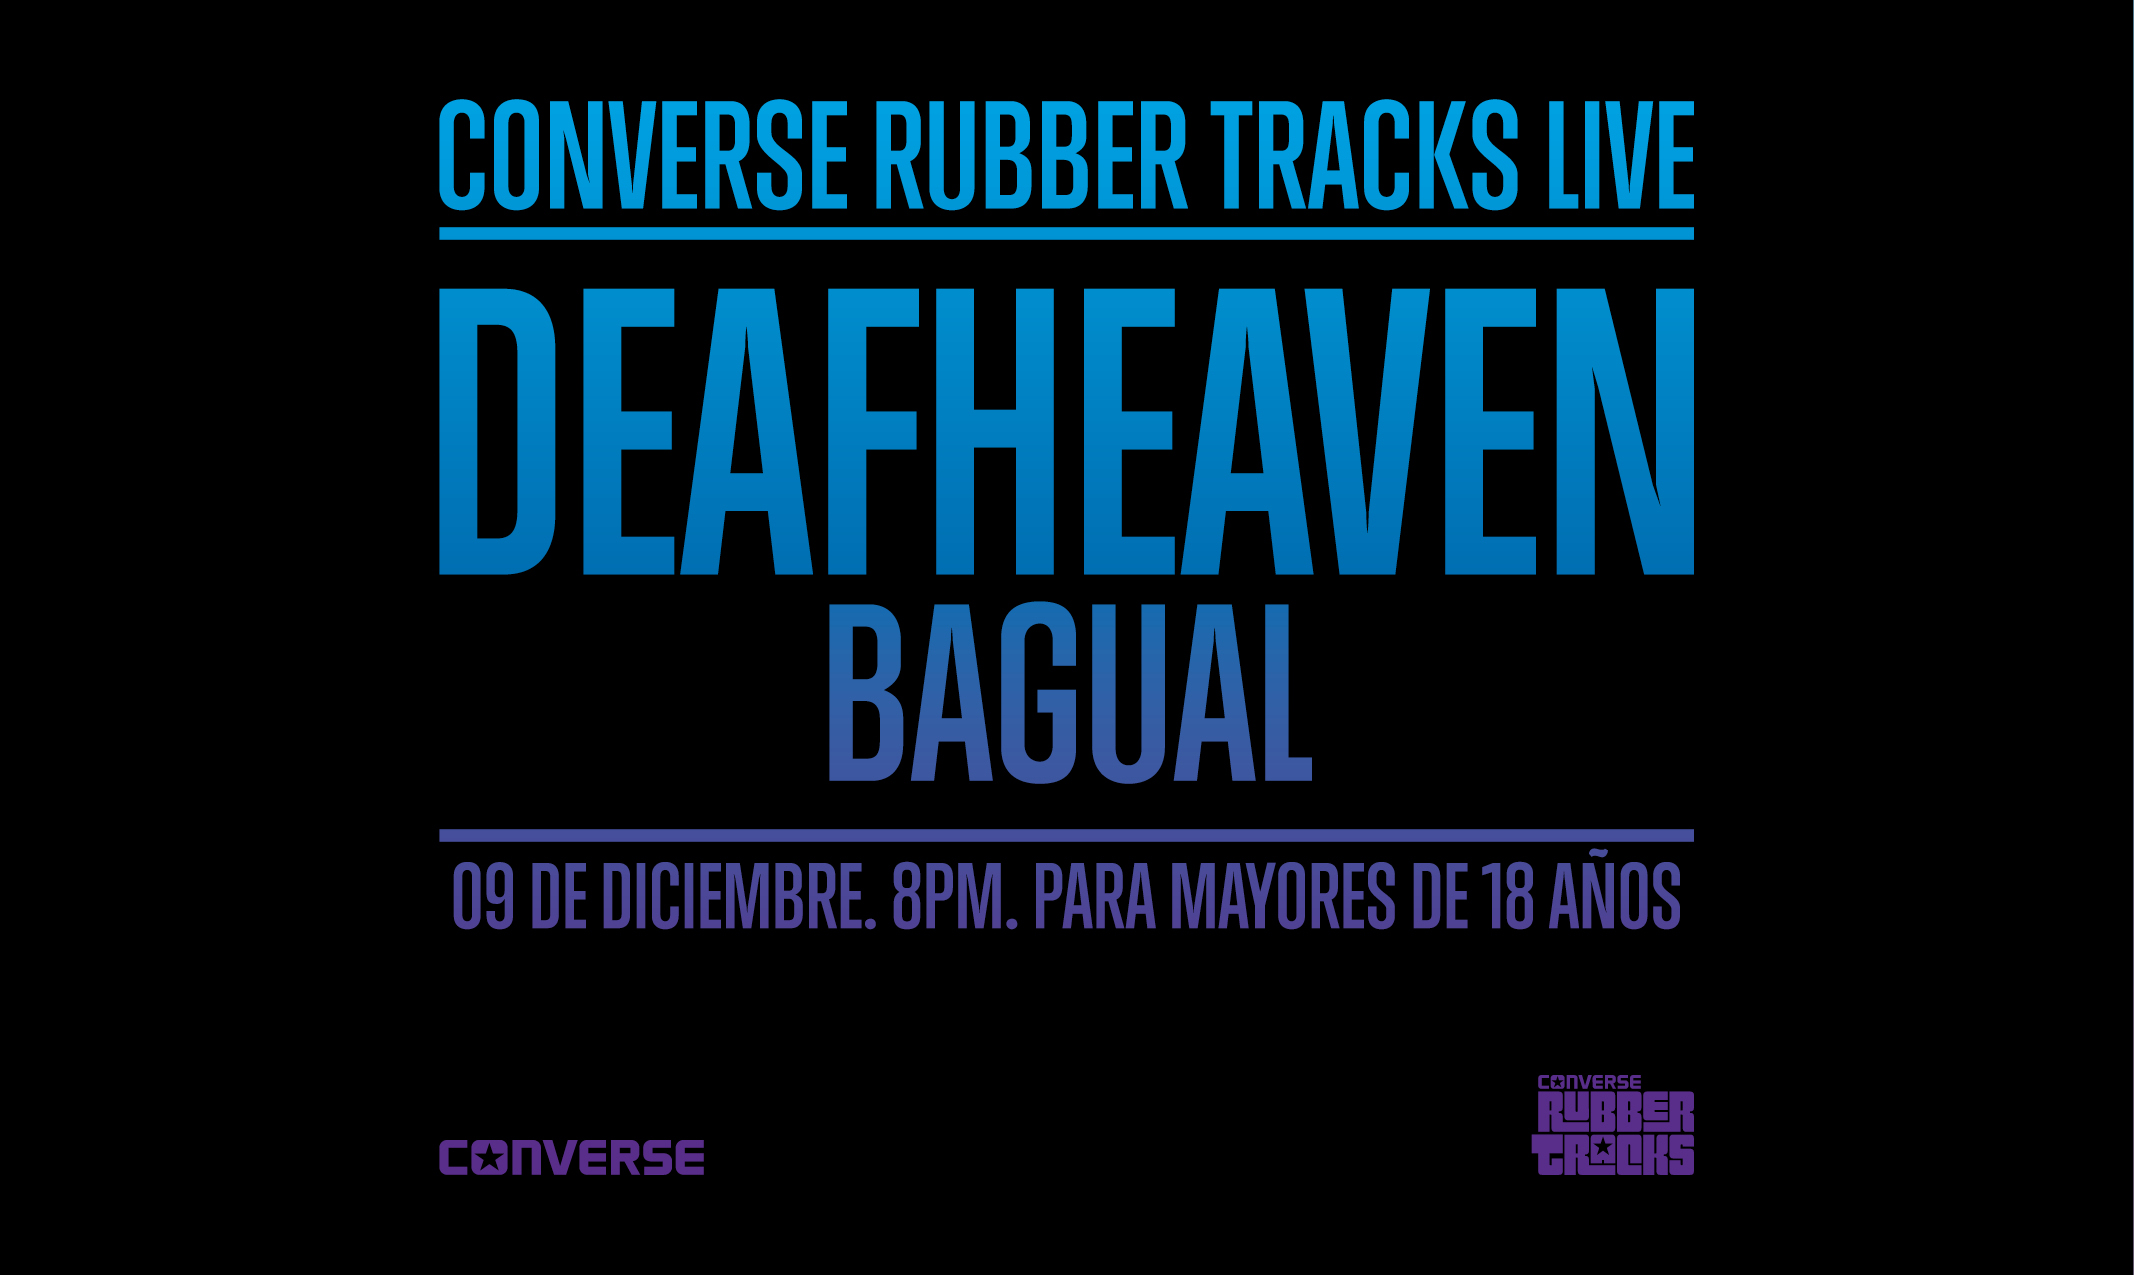 Converse Rubber Tracks Live DEAFHEAVEN